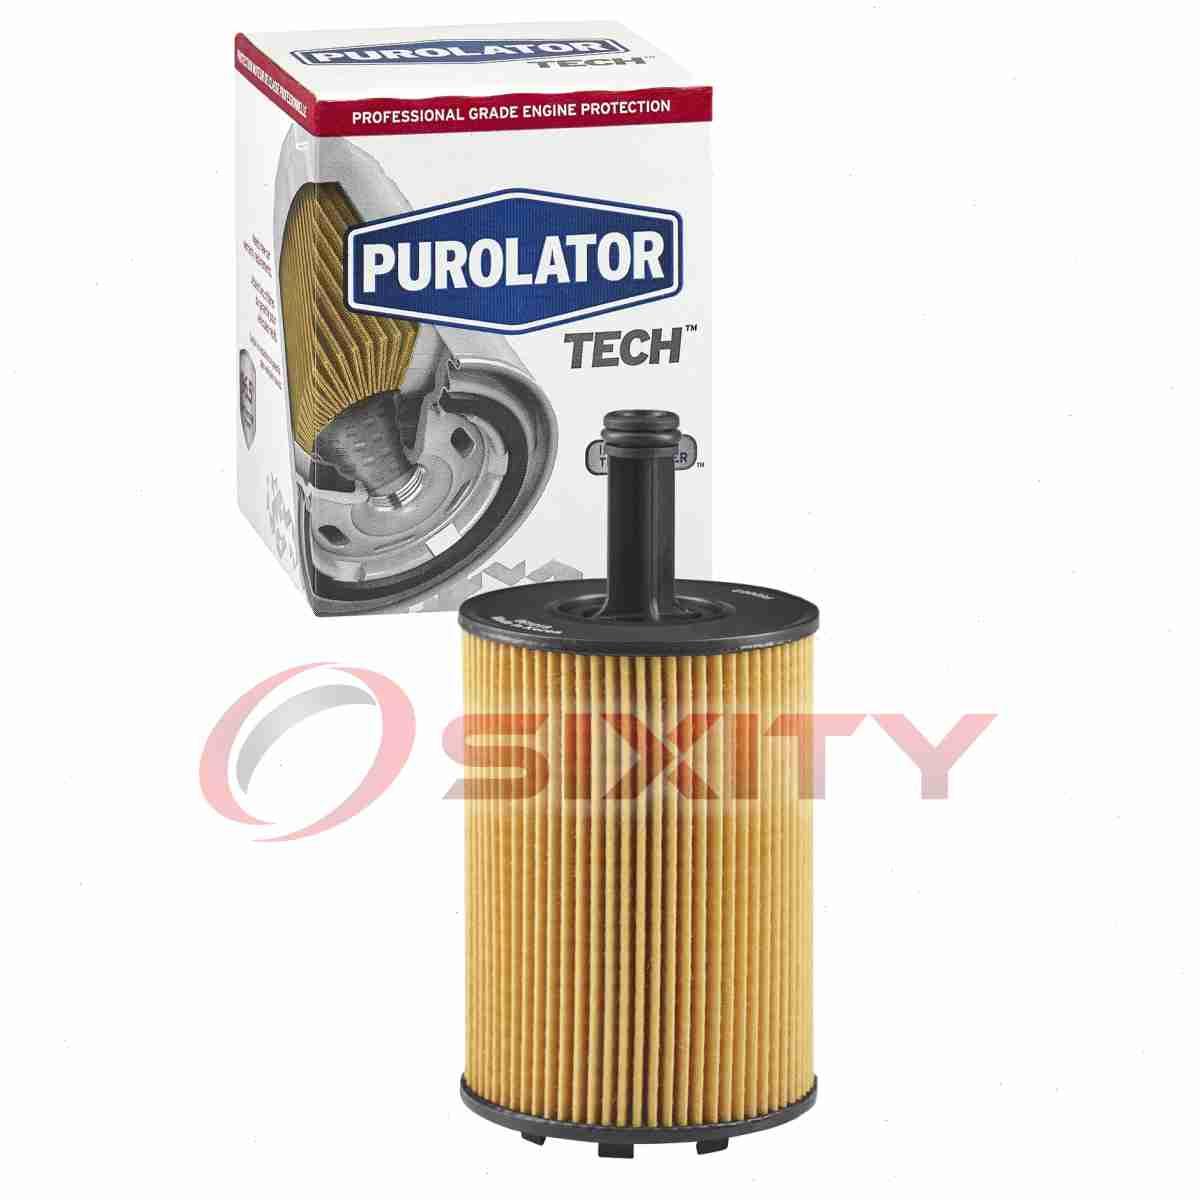 Long bc Purolator TECH Engine Oil Filter for 2014-2018 Dodge Grand Caravan